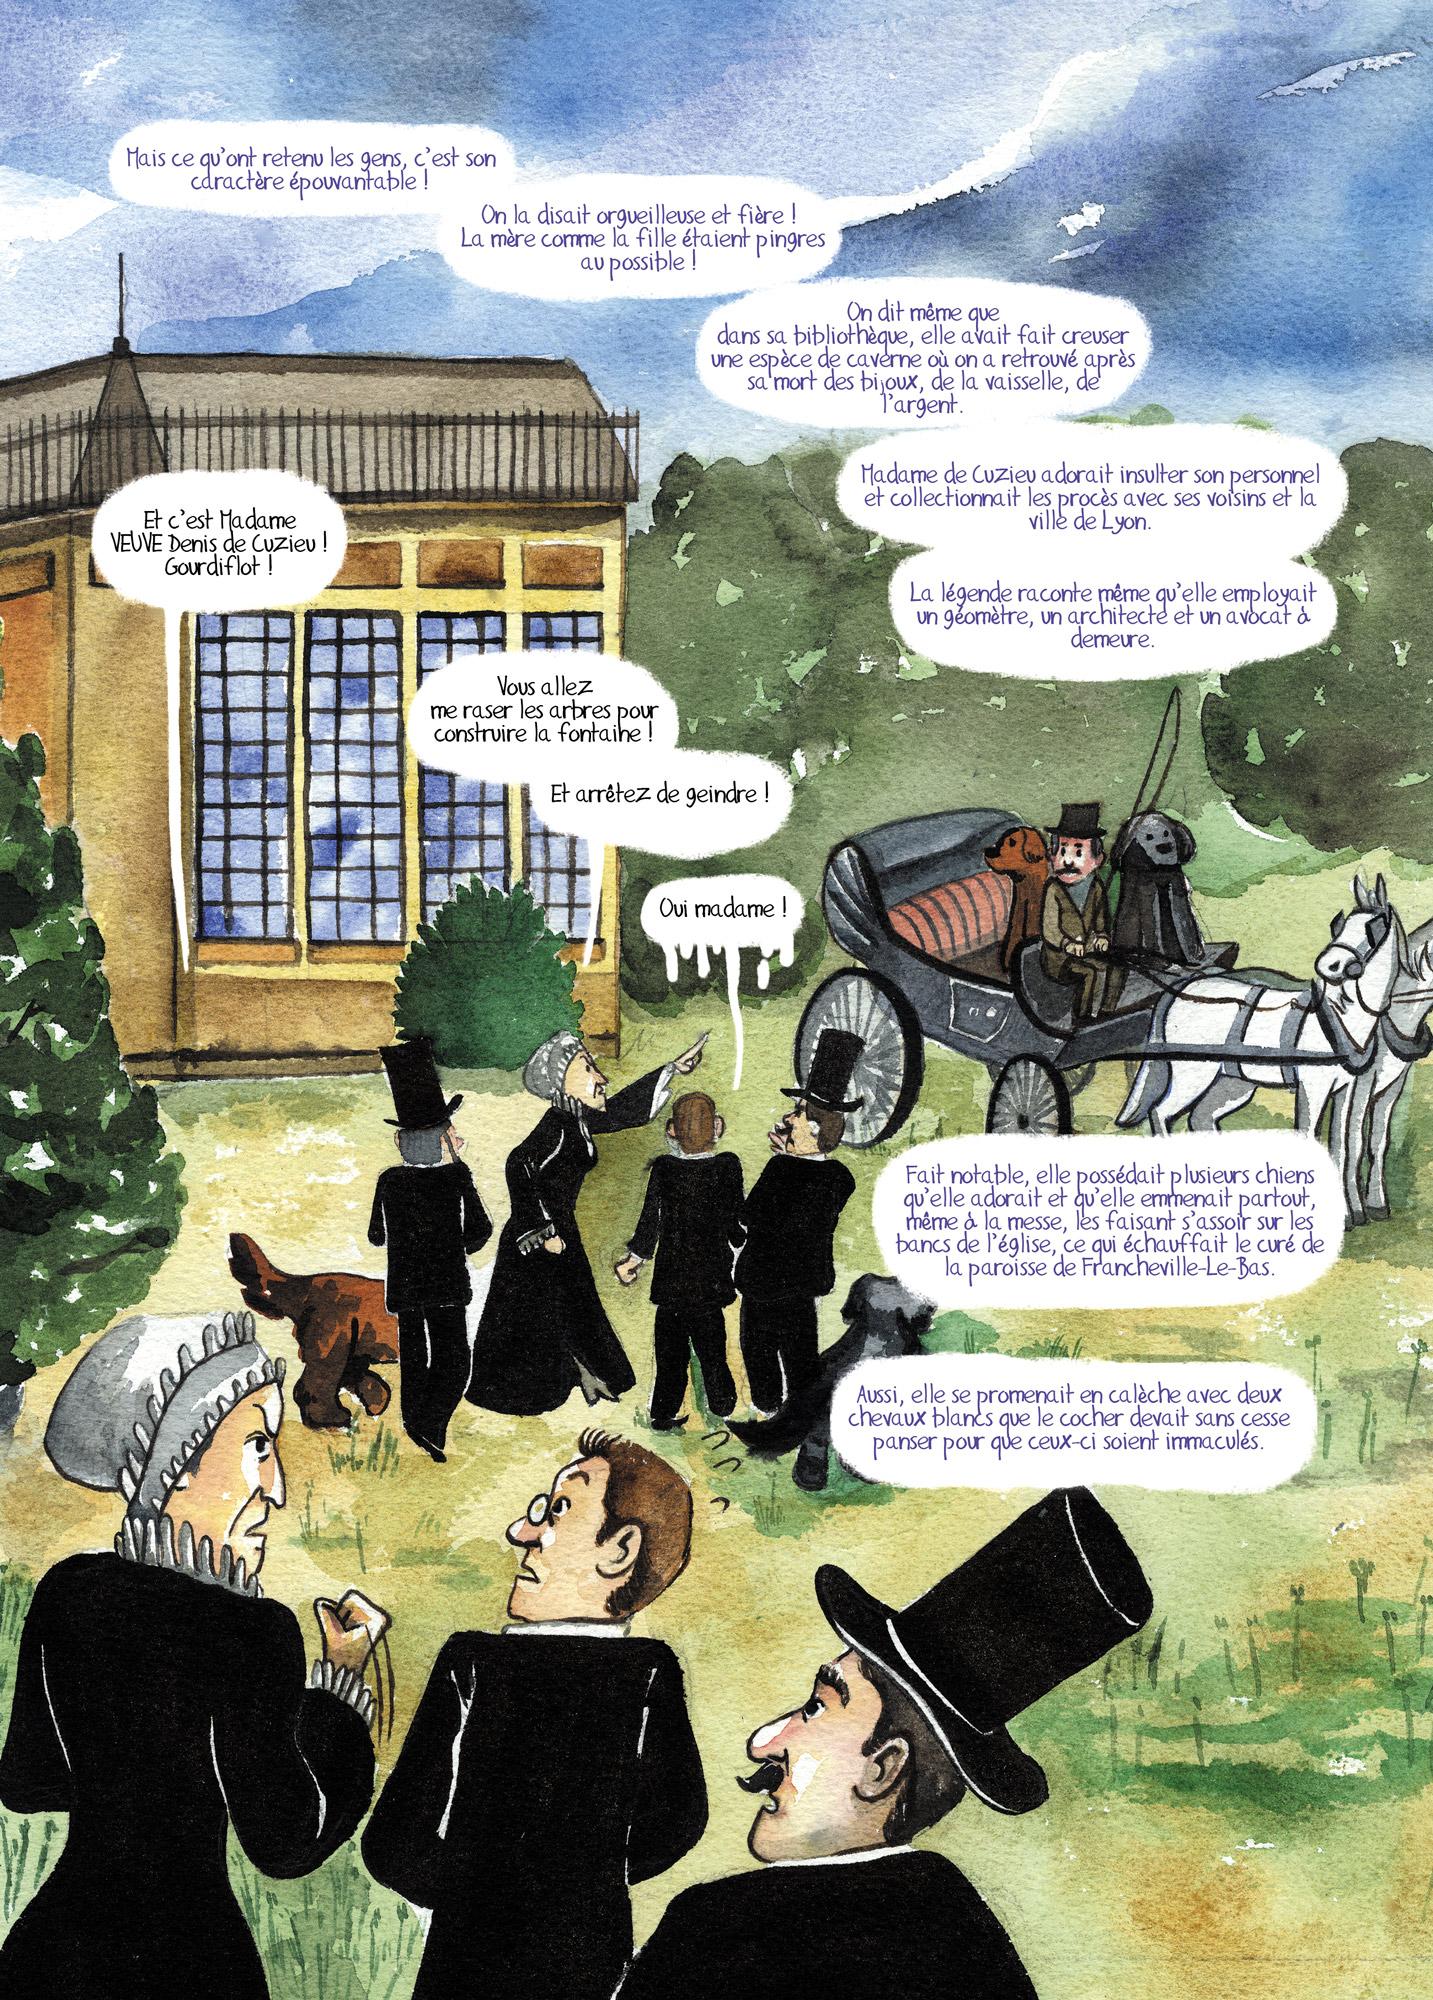 Bibliothèque Ste Foy Les Lyon la dame du plan du loup – emy, illustration bd